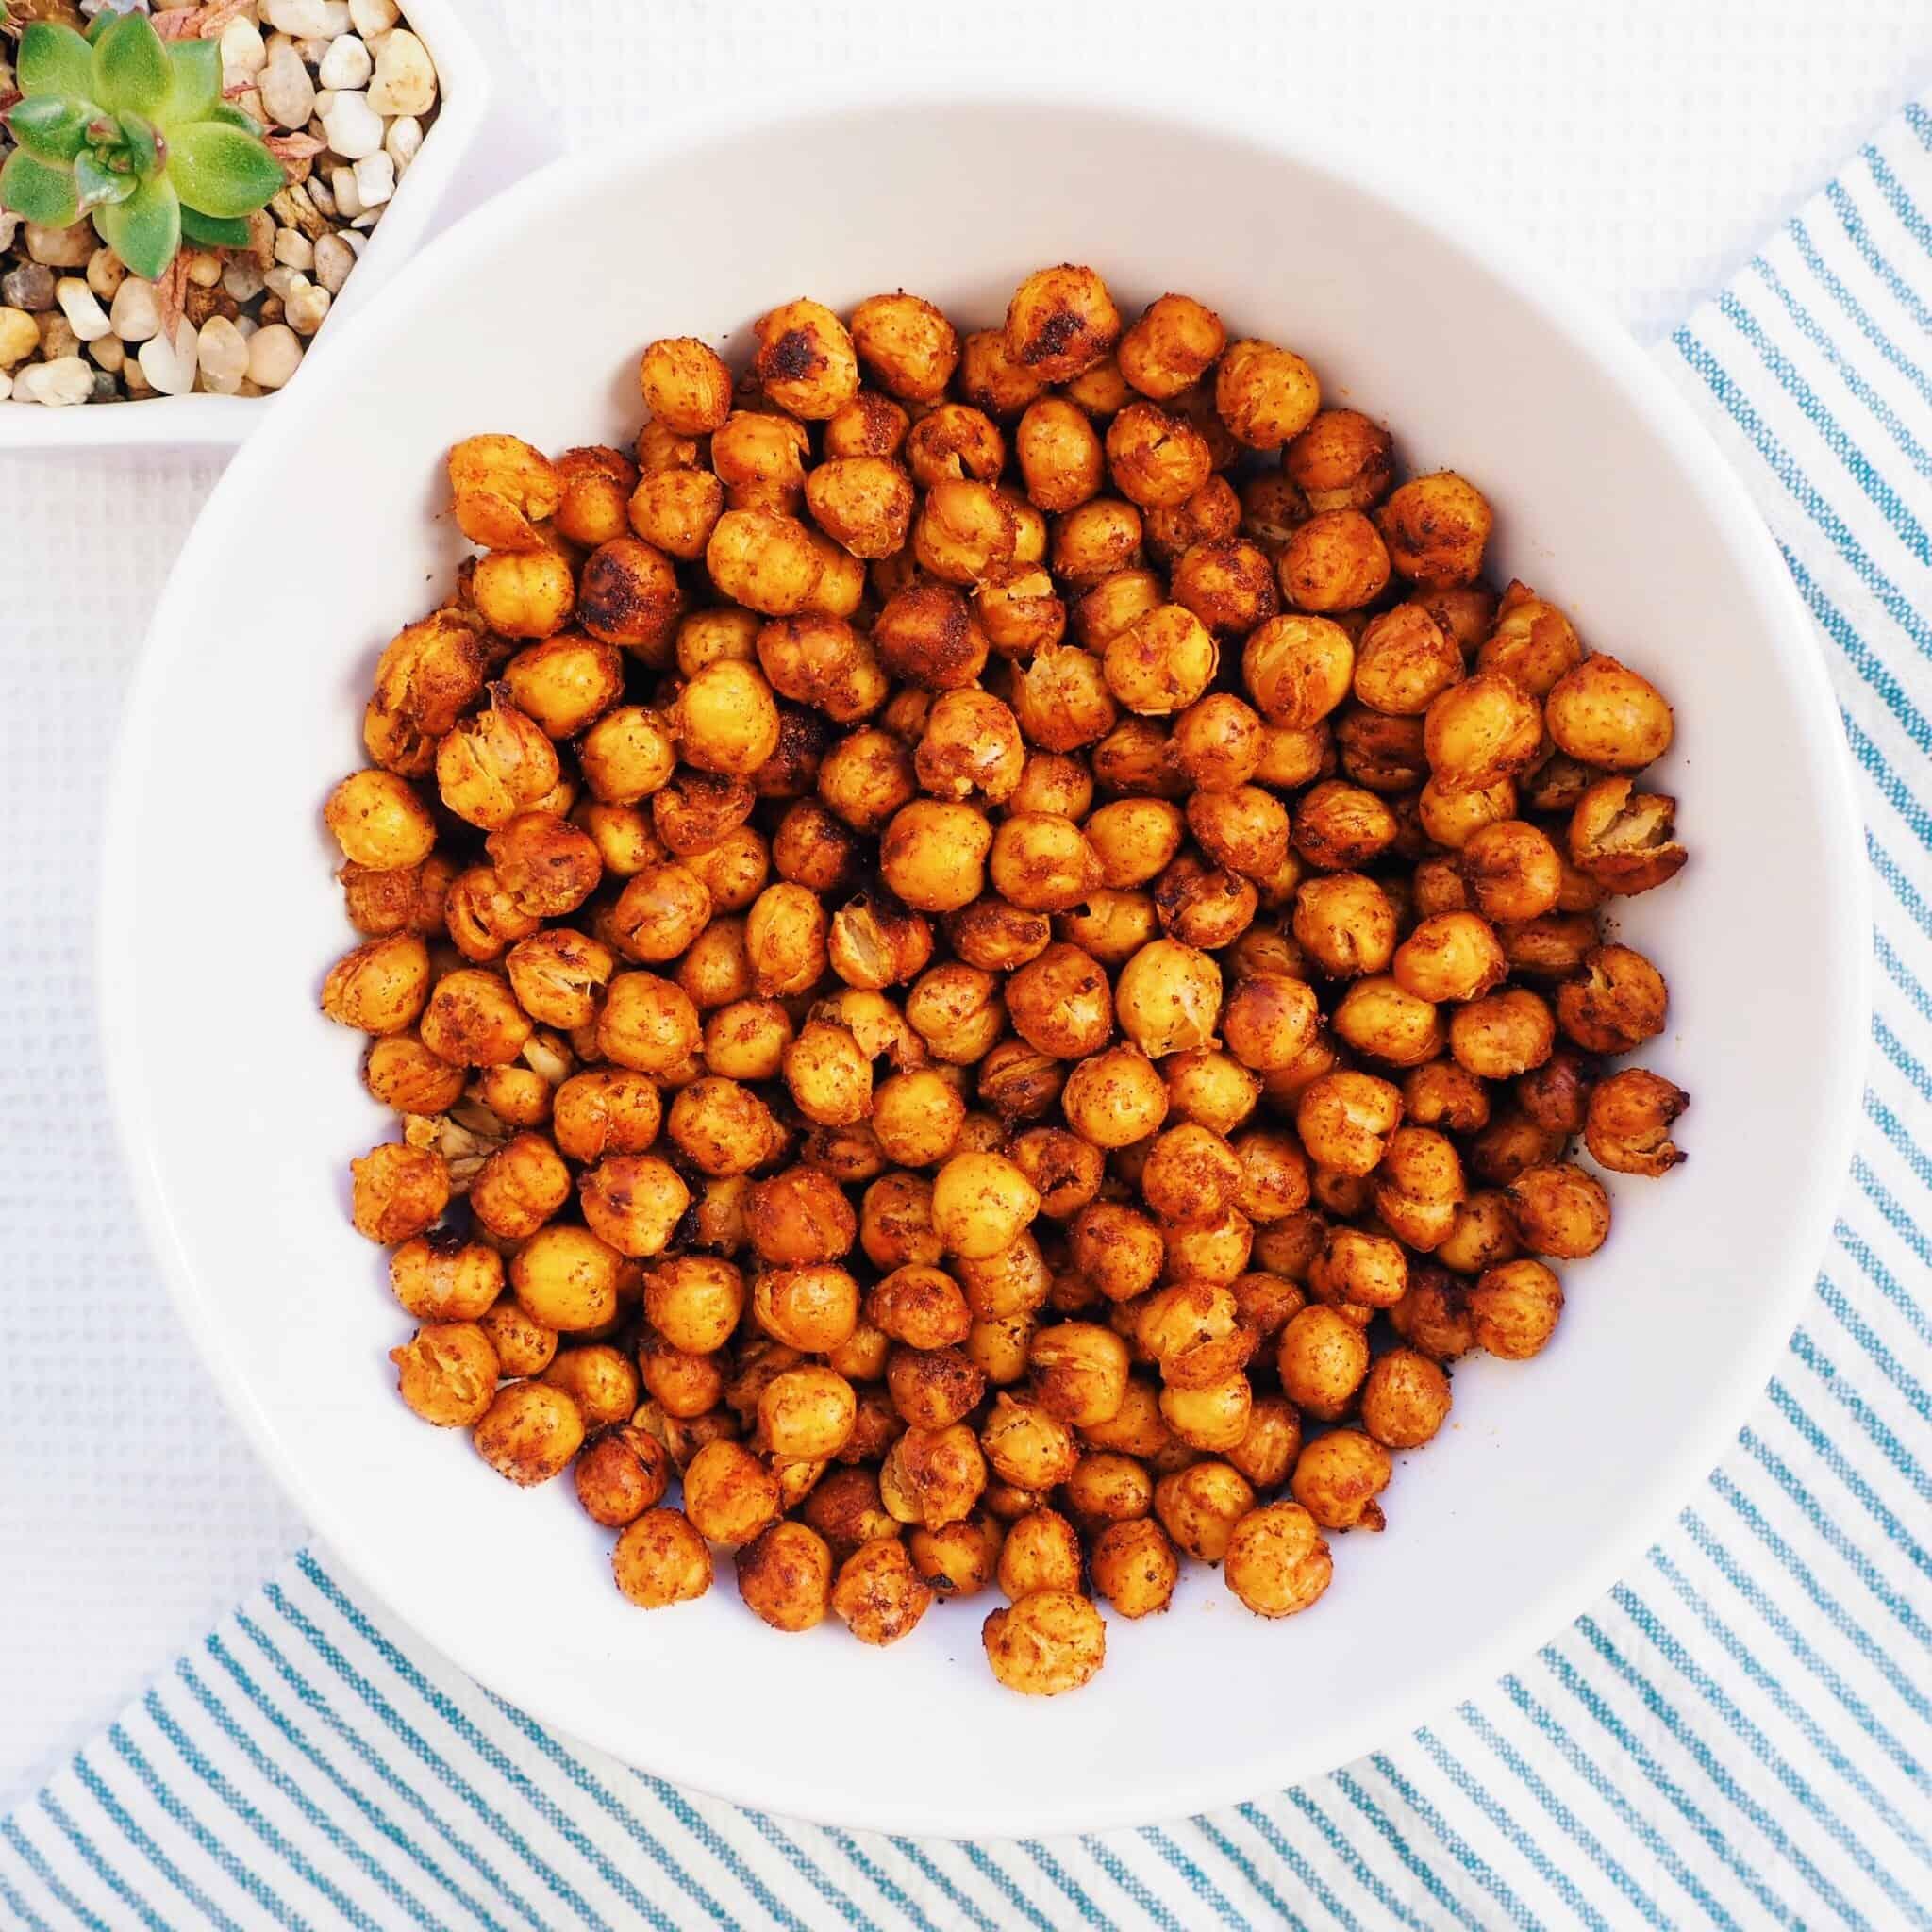 Roasted Garlic Paprika Chickpeas